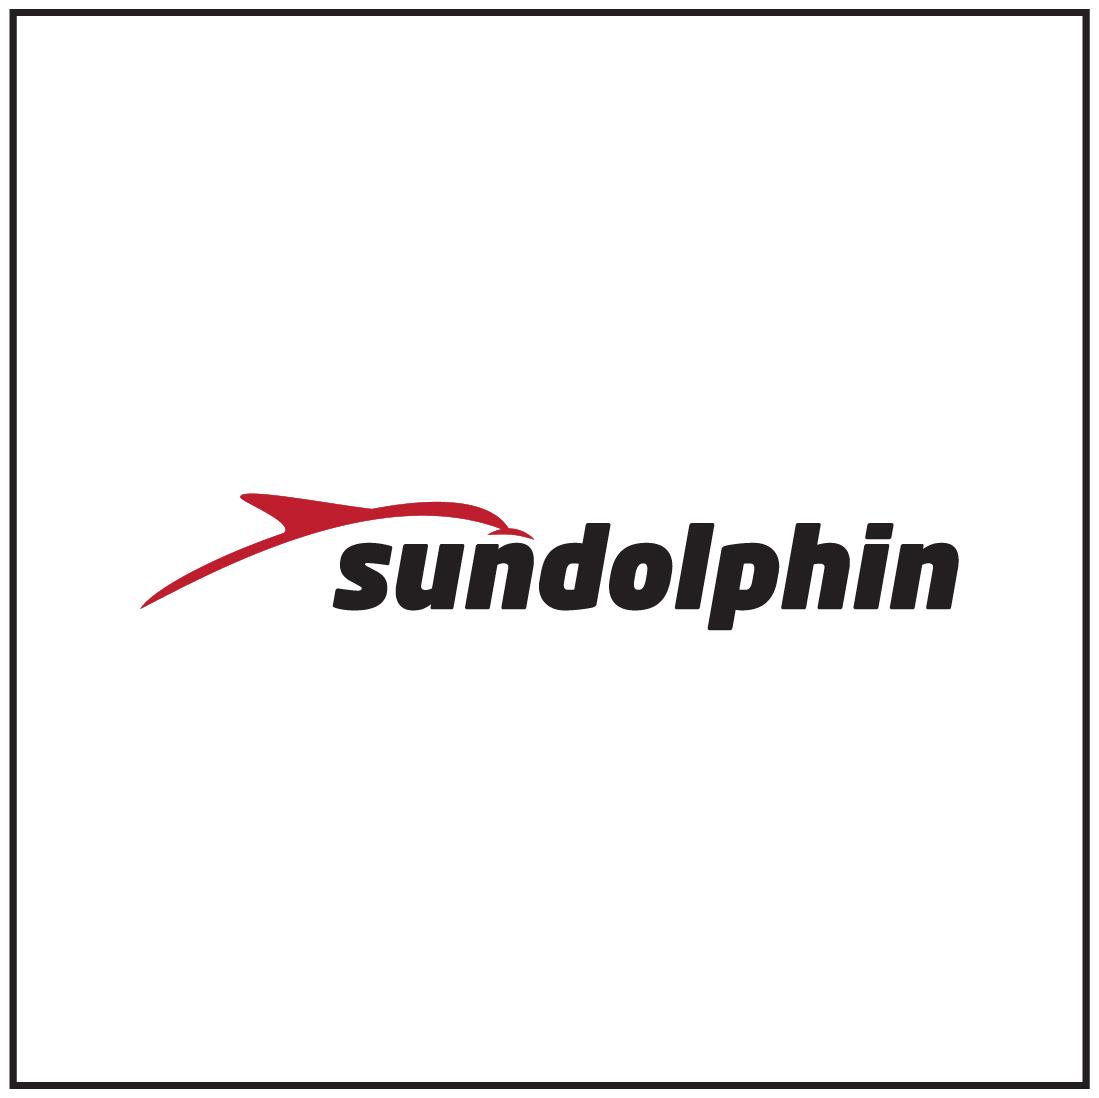 Logo-SM-SunDolphin.jpg